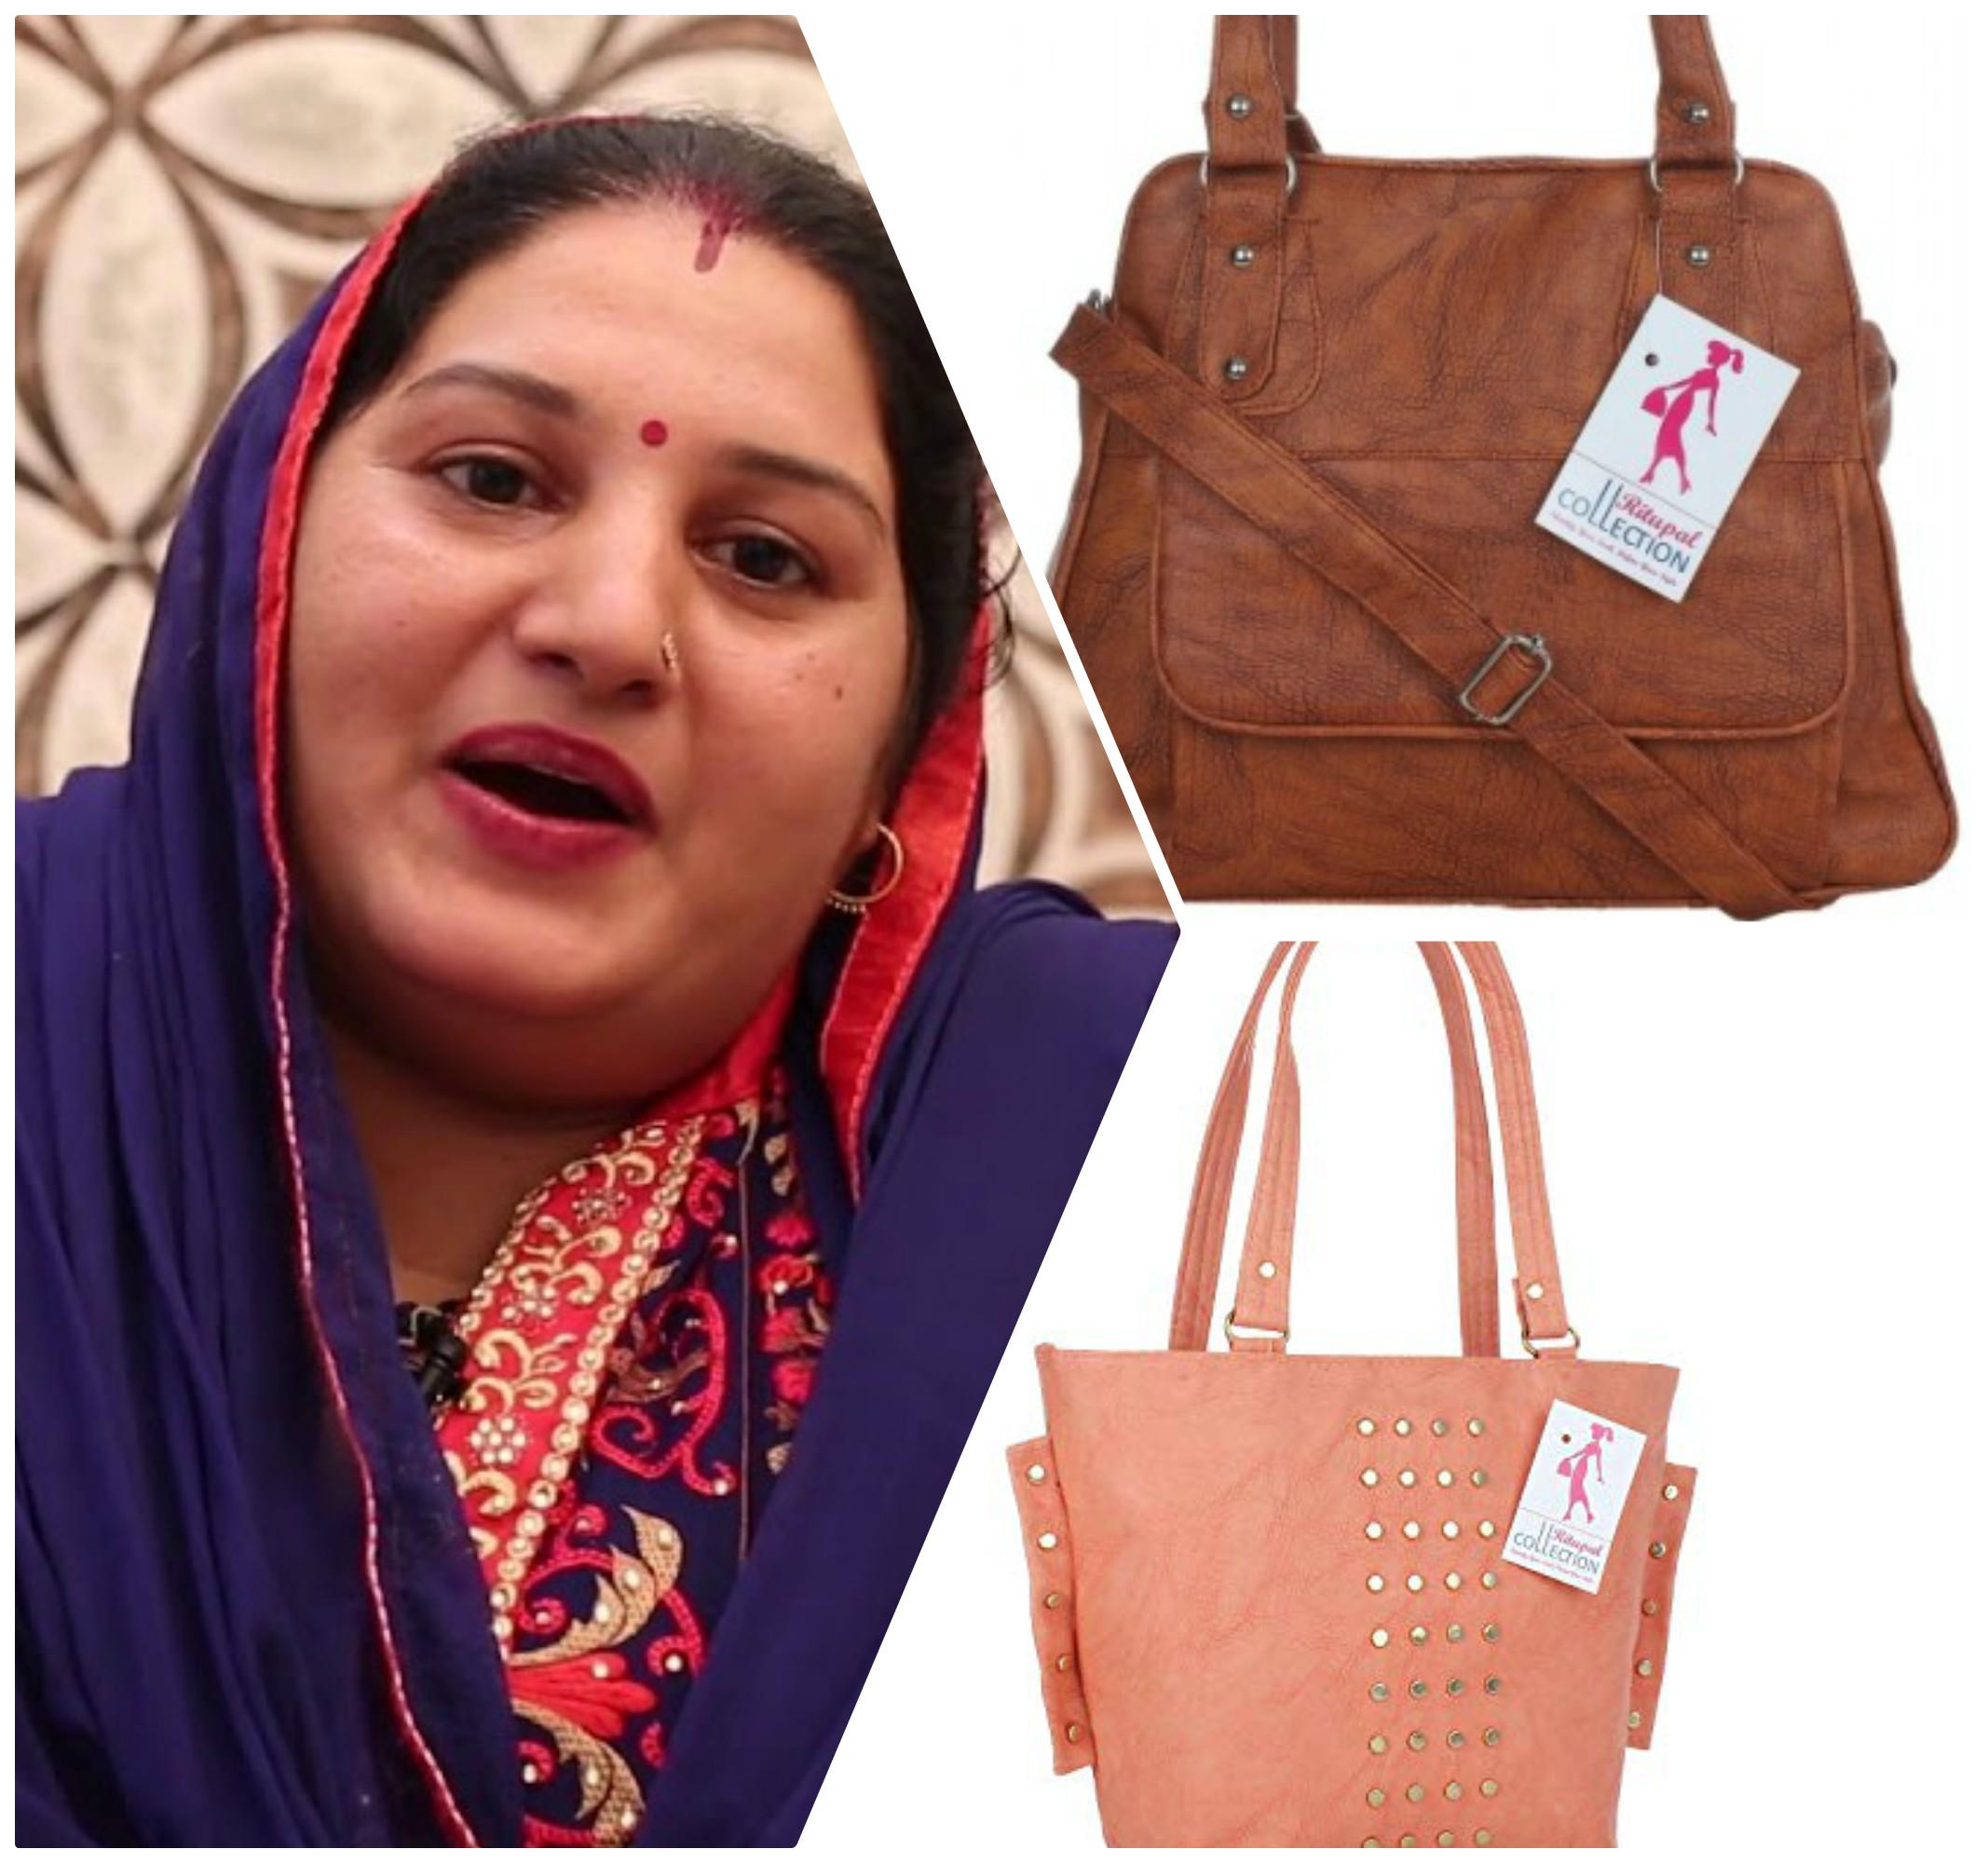 PunjabKesari, Ritu Kaushik Image, Success Story Image, Women Achievers Image